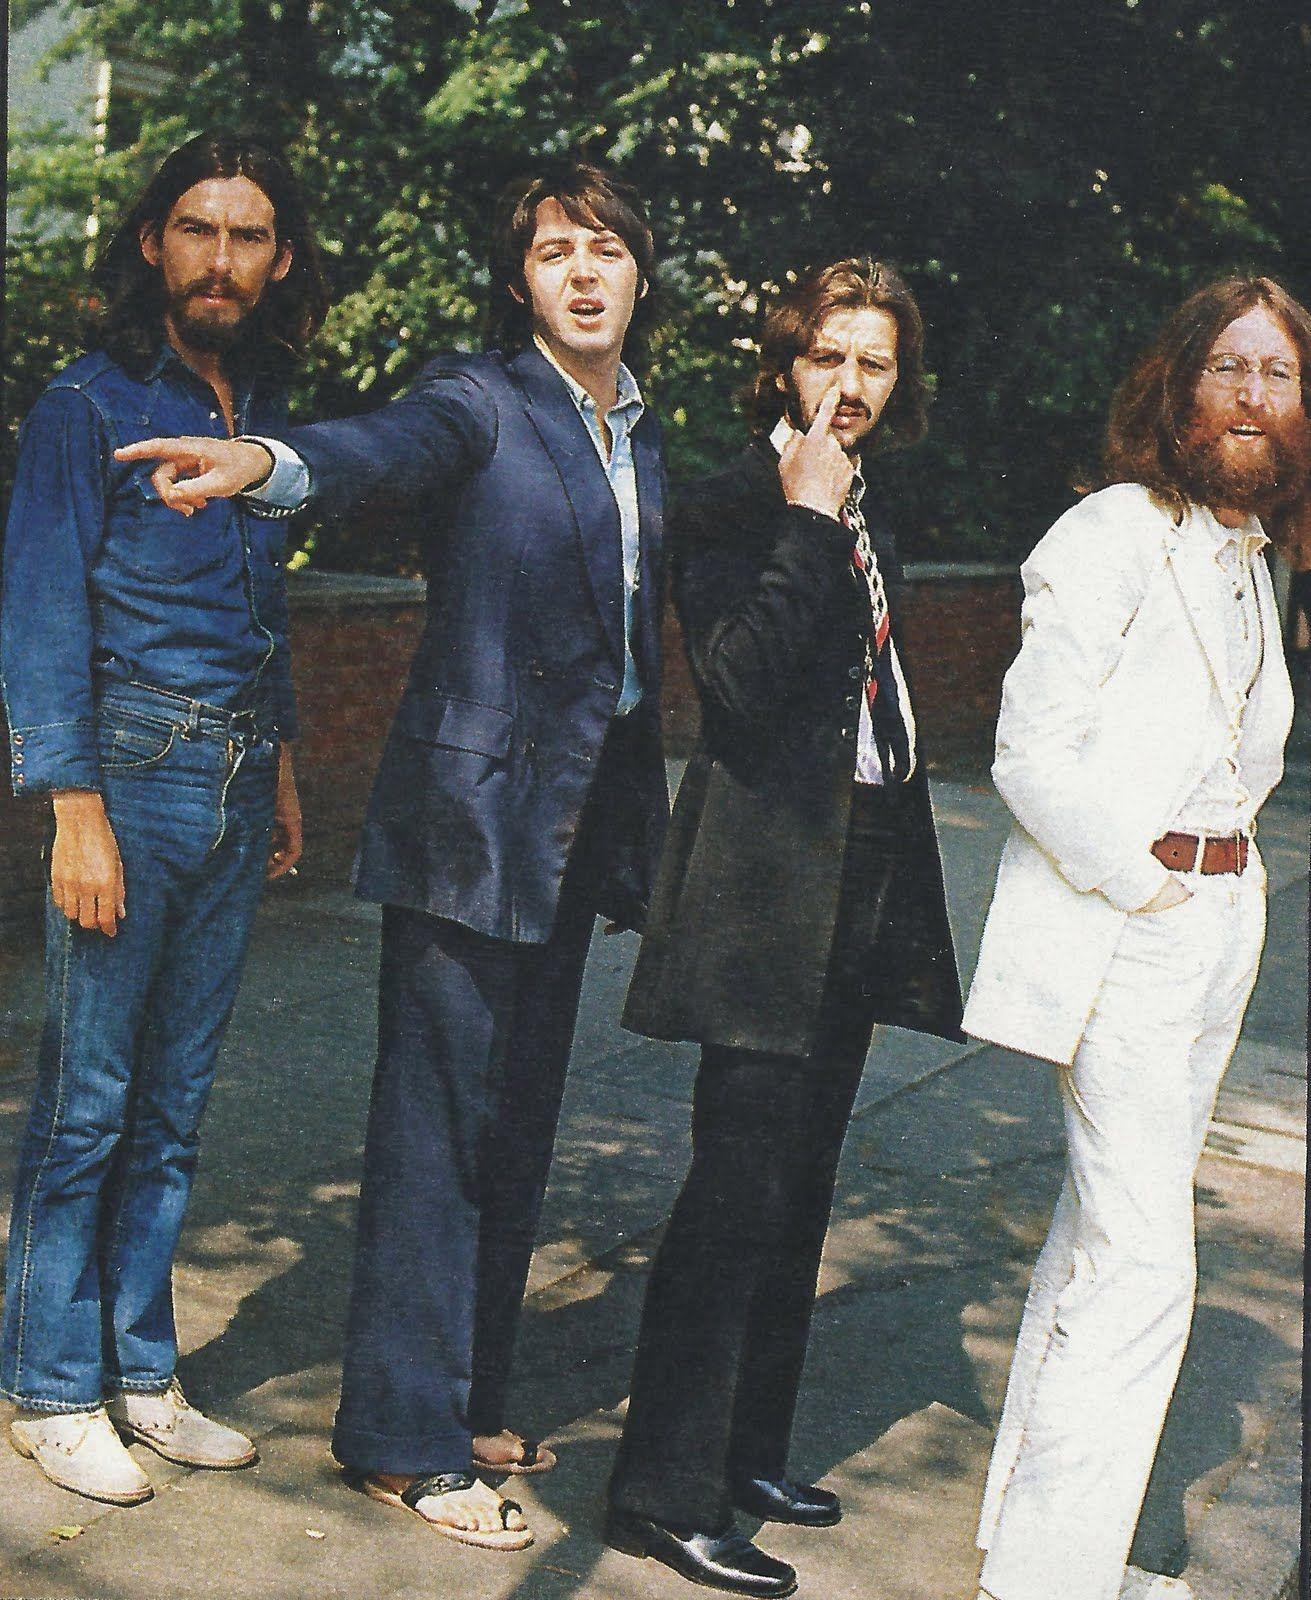 Beatles Abbey Road crossing. Paul with sandals. | The beatles, Beatles  photos, Paul mccartney